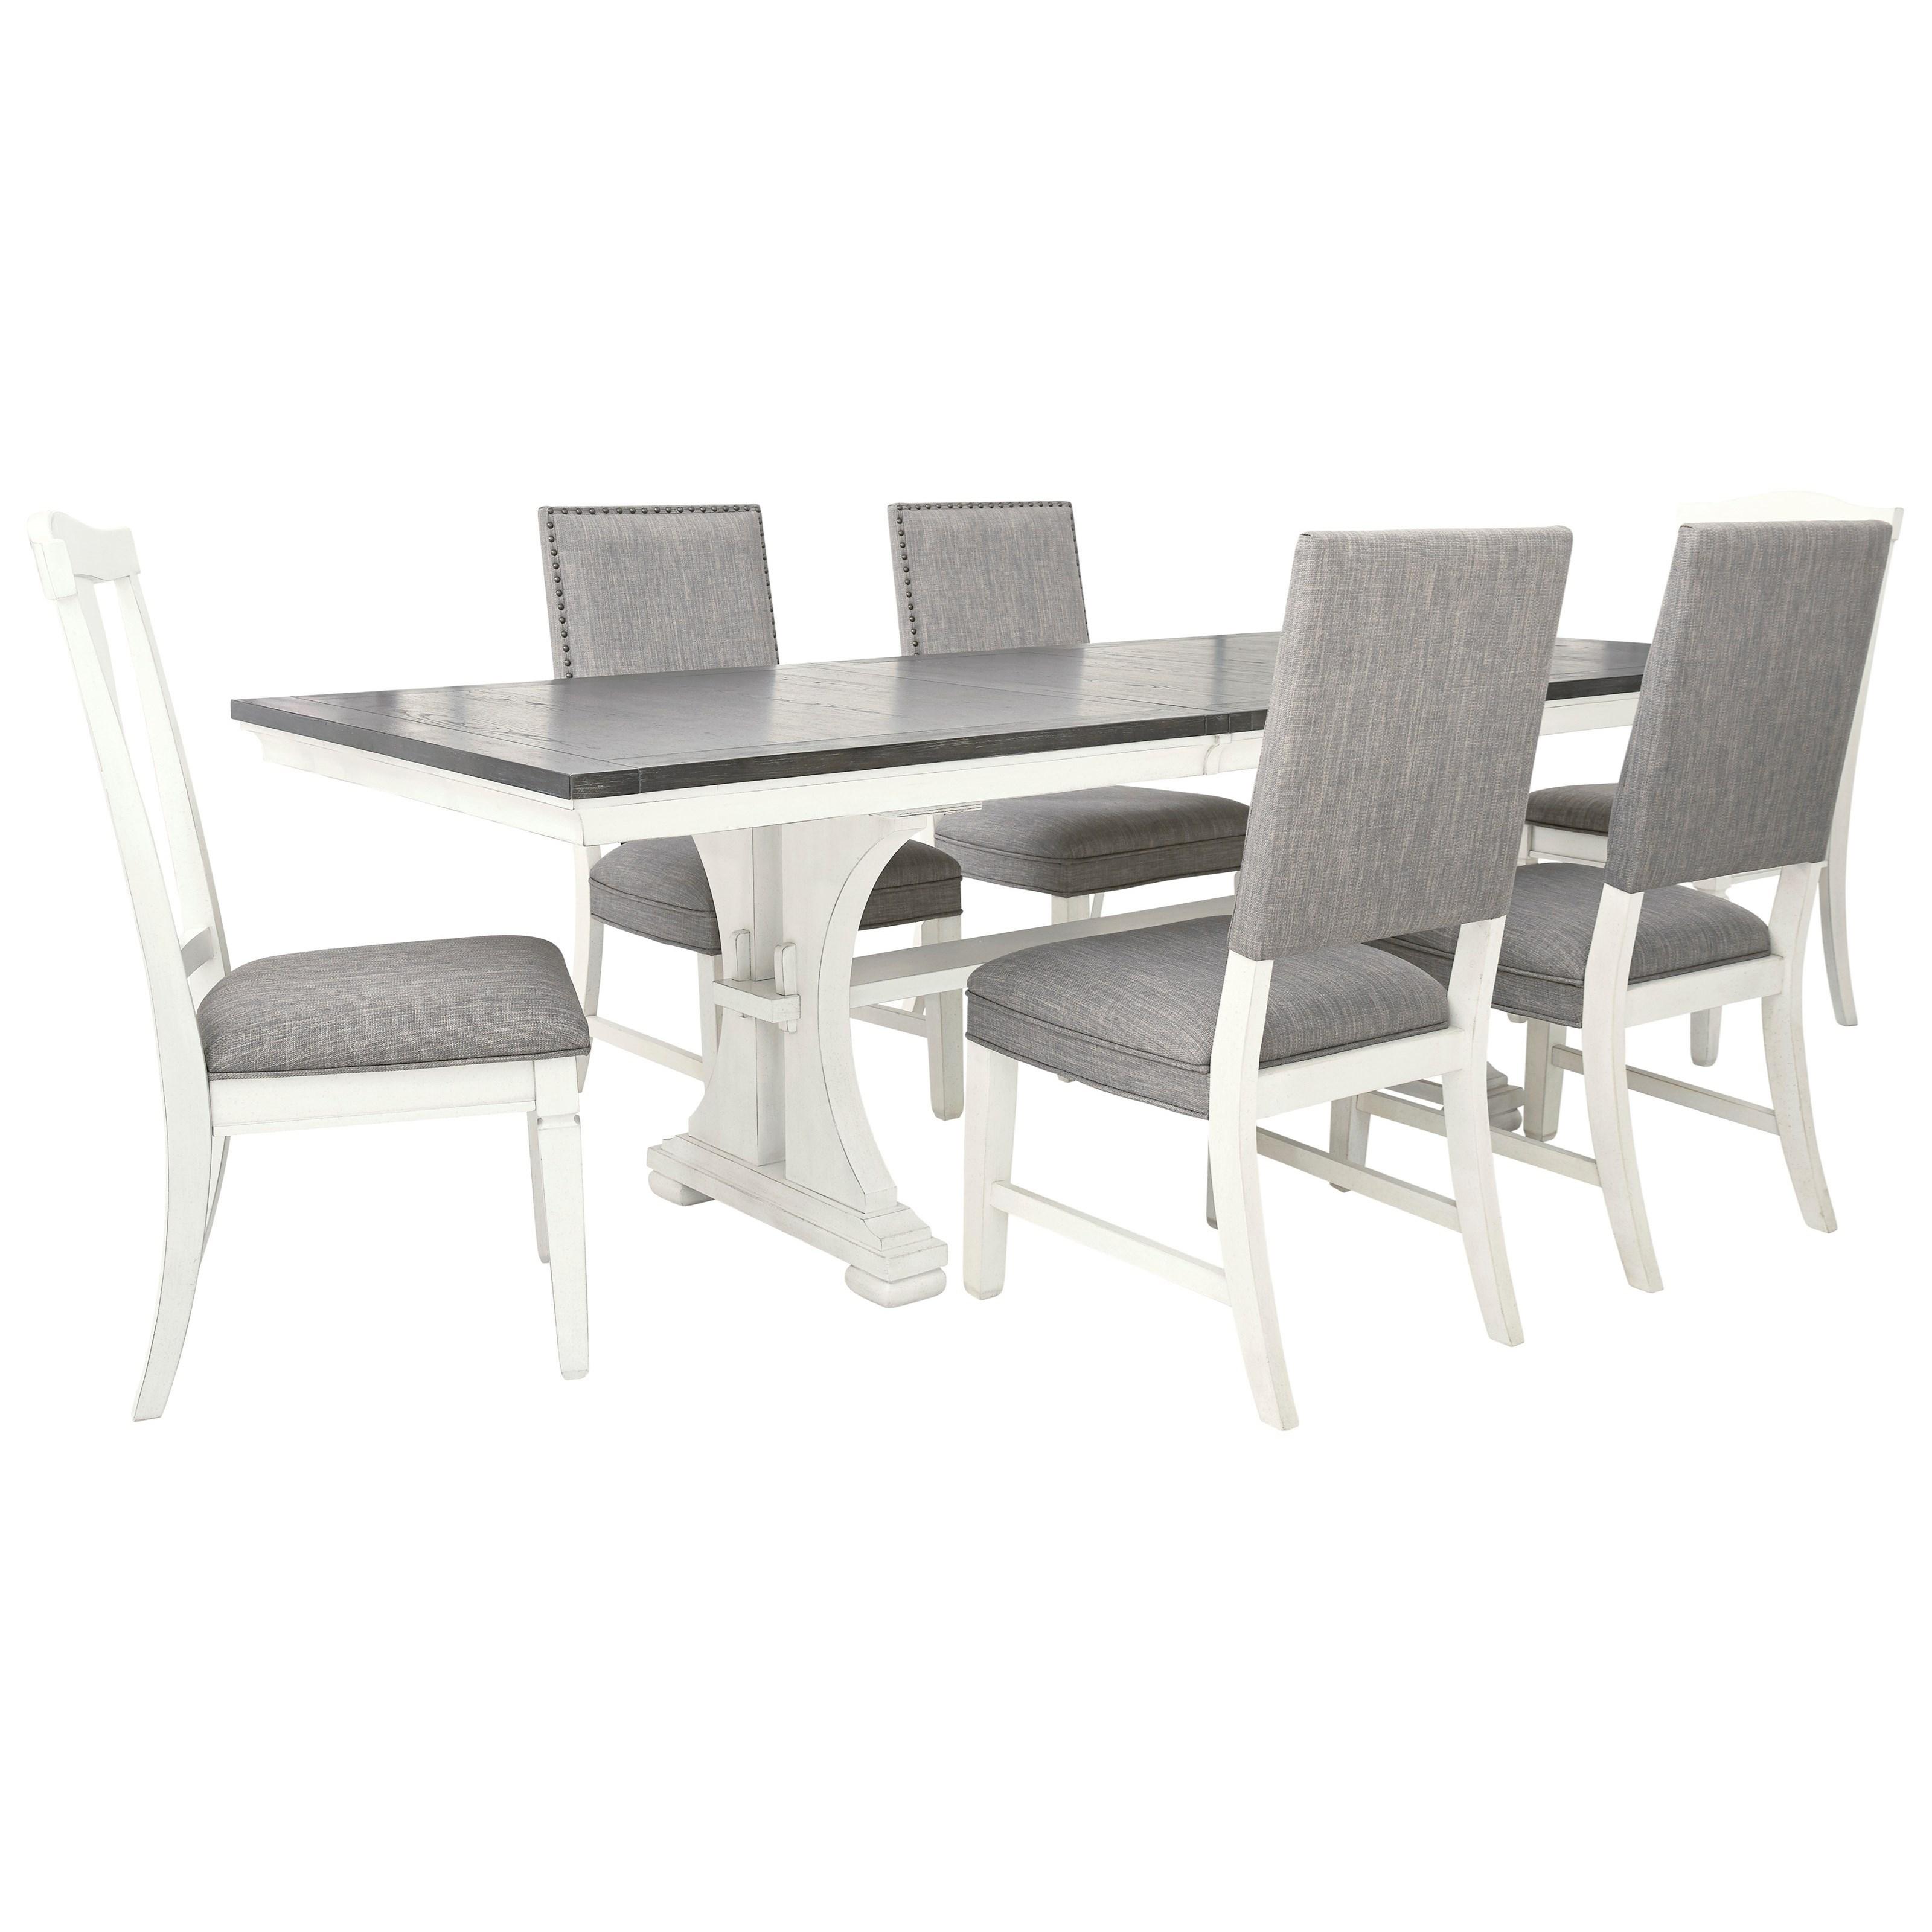 Nashbryn Dining Set by Benchcraft at Walker's Furniture